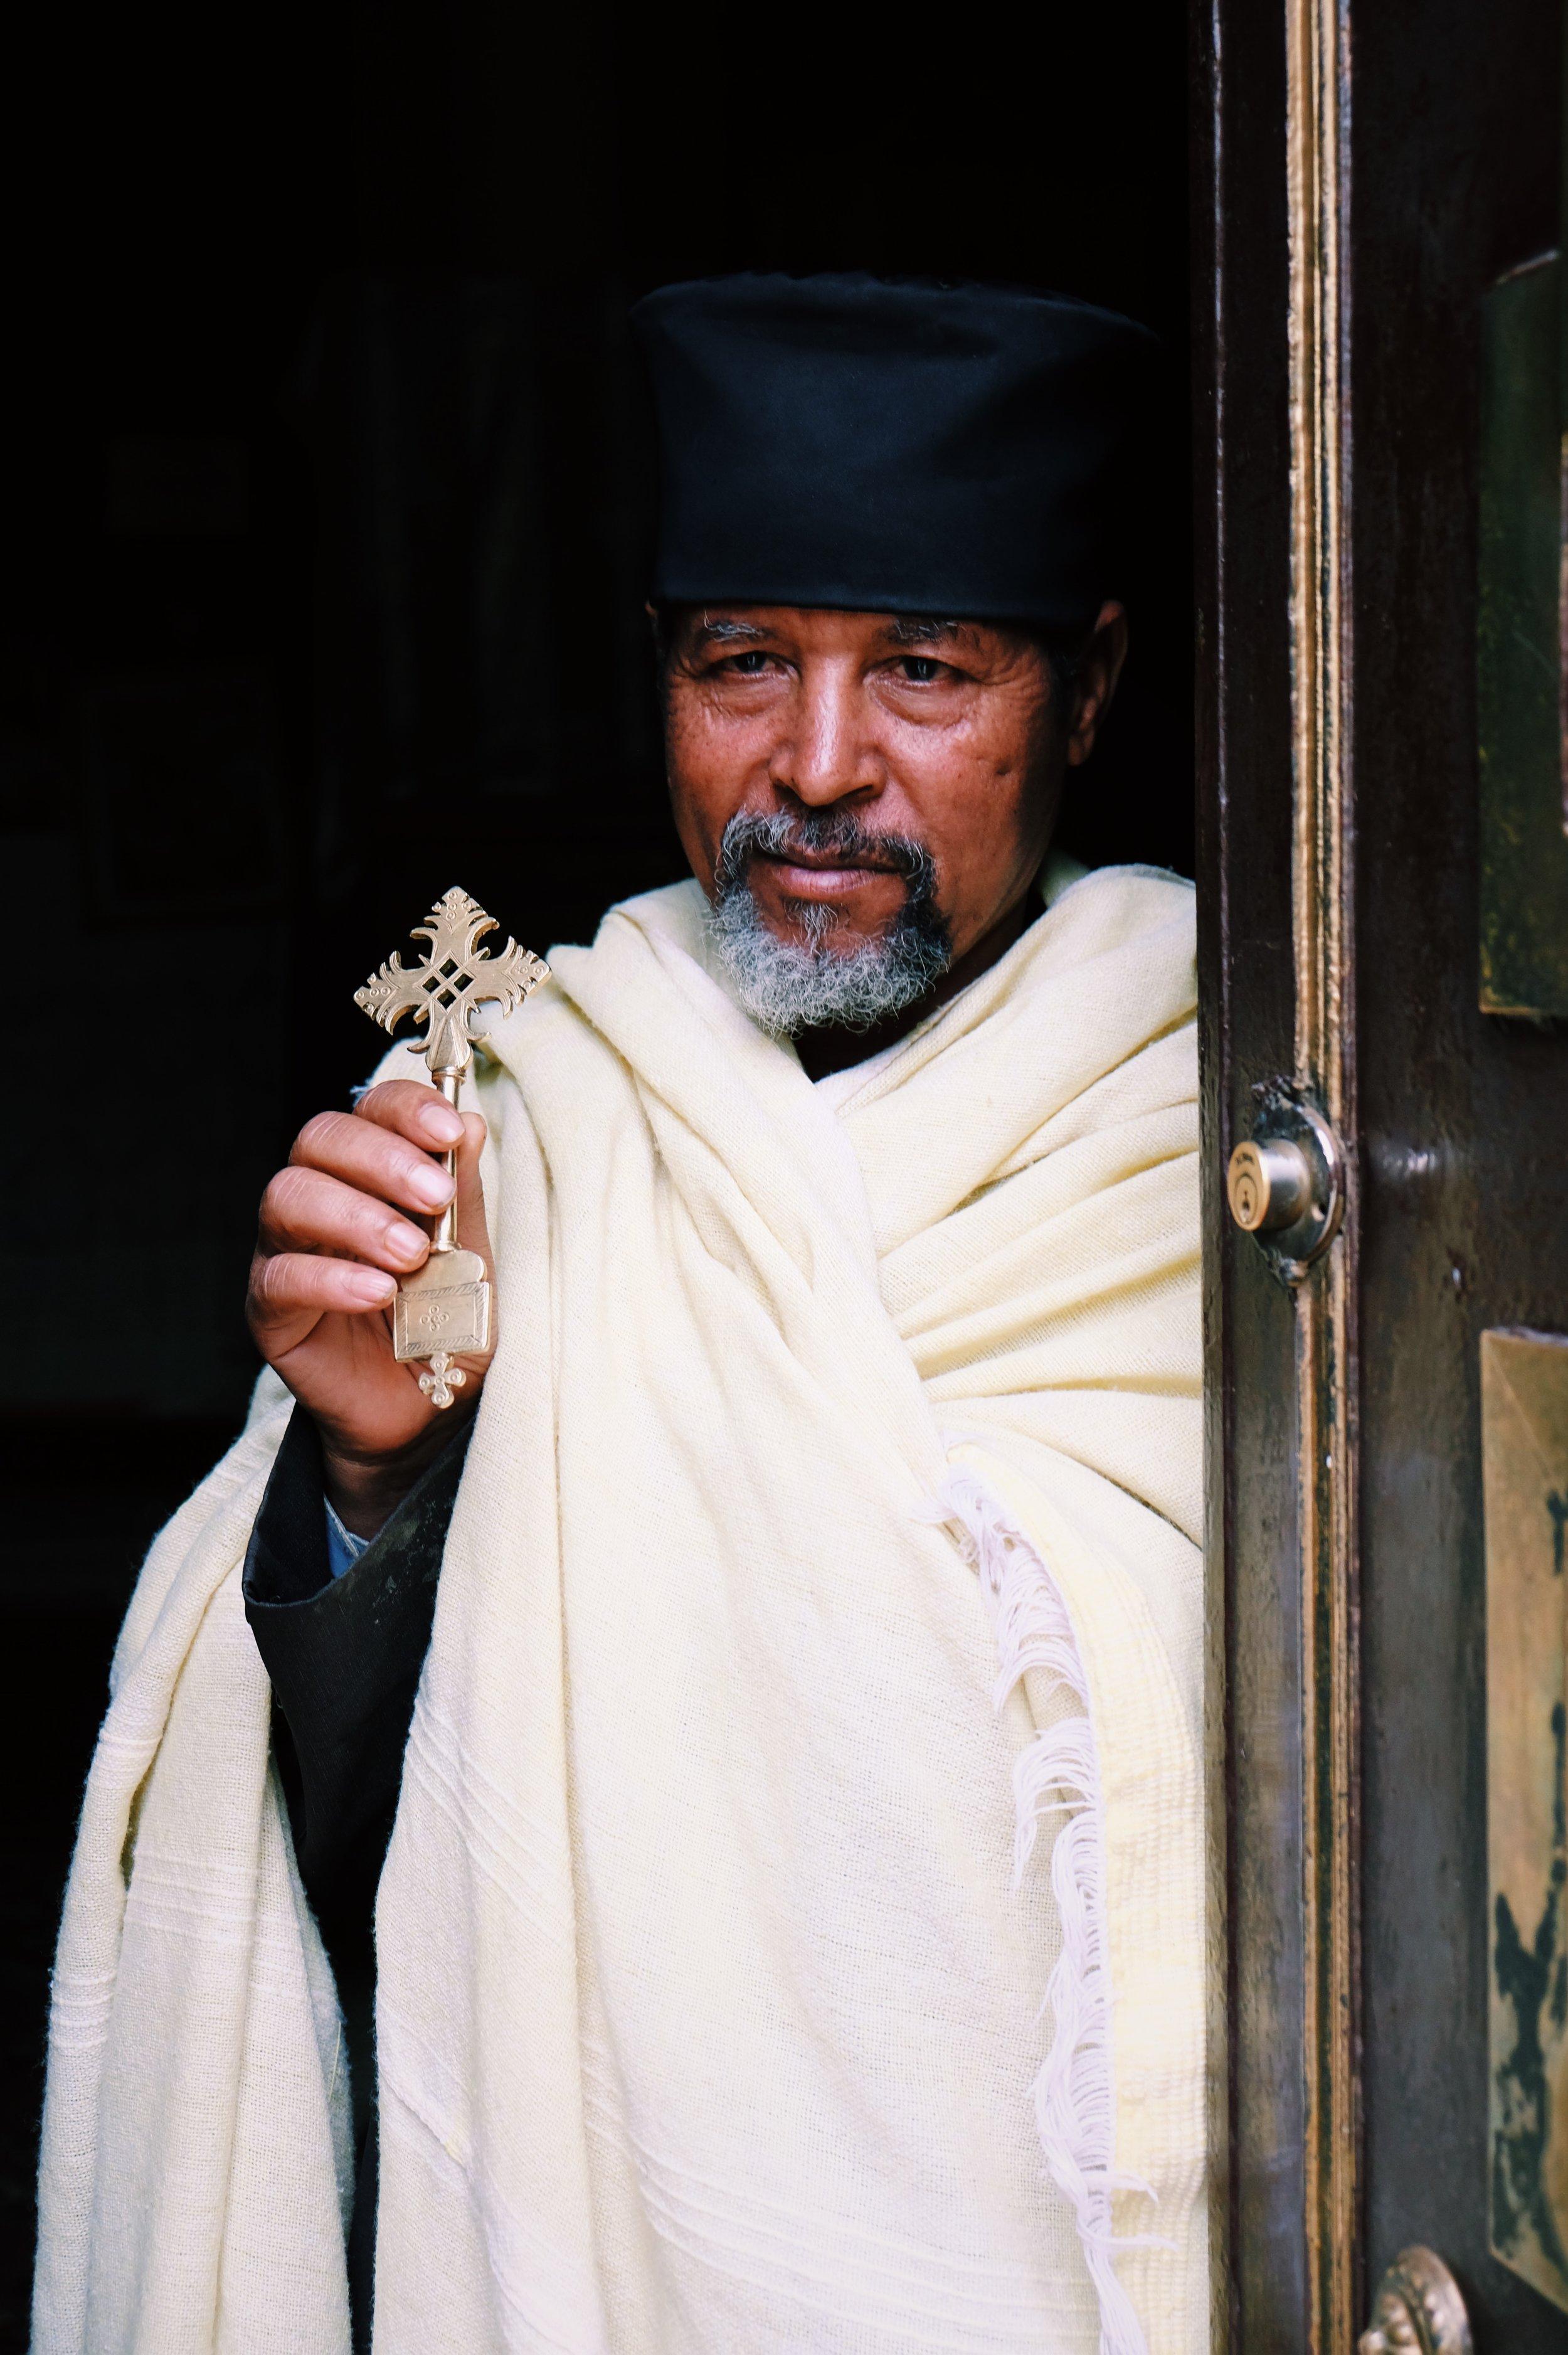 Monk in Addis, St George in Ethiopia by Joost Bastmeijer.jpeg